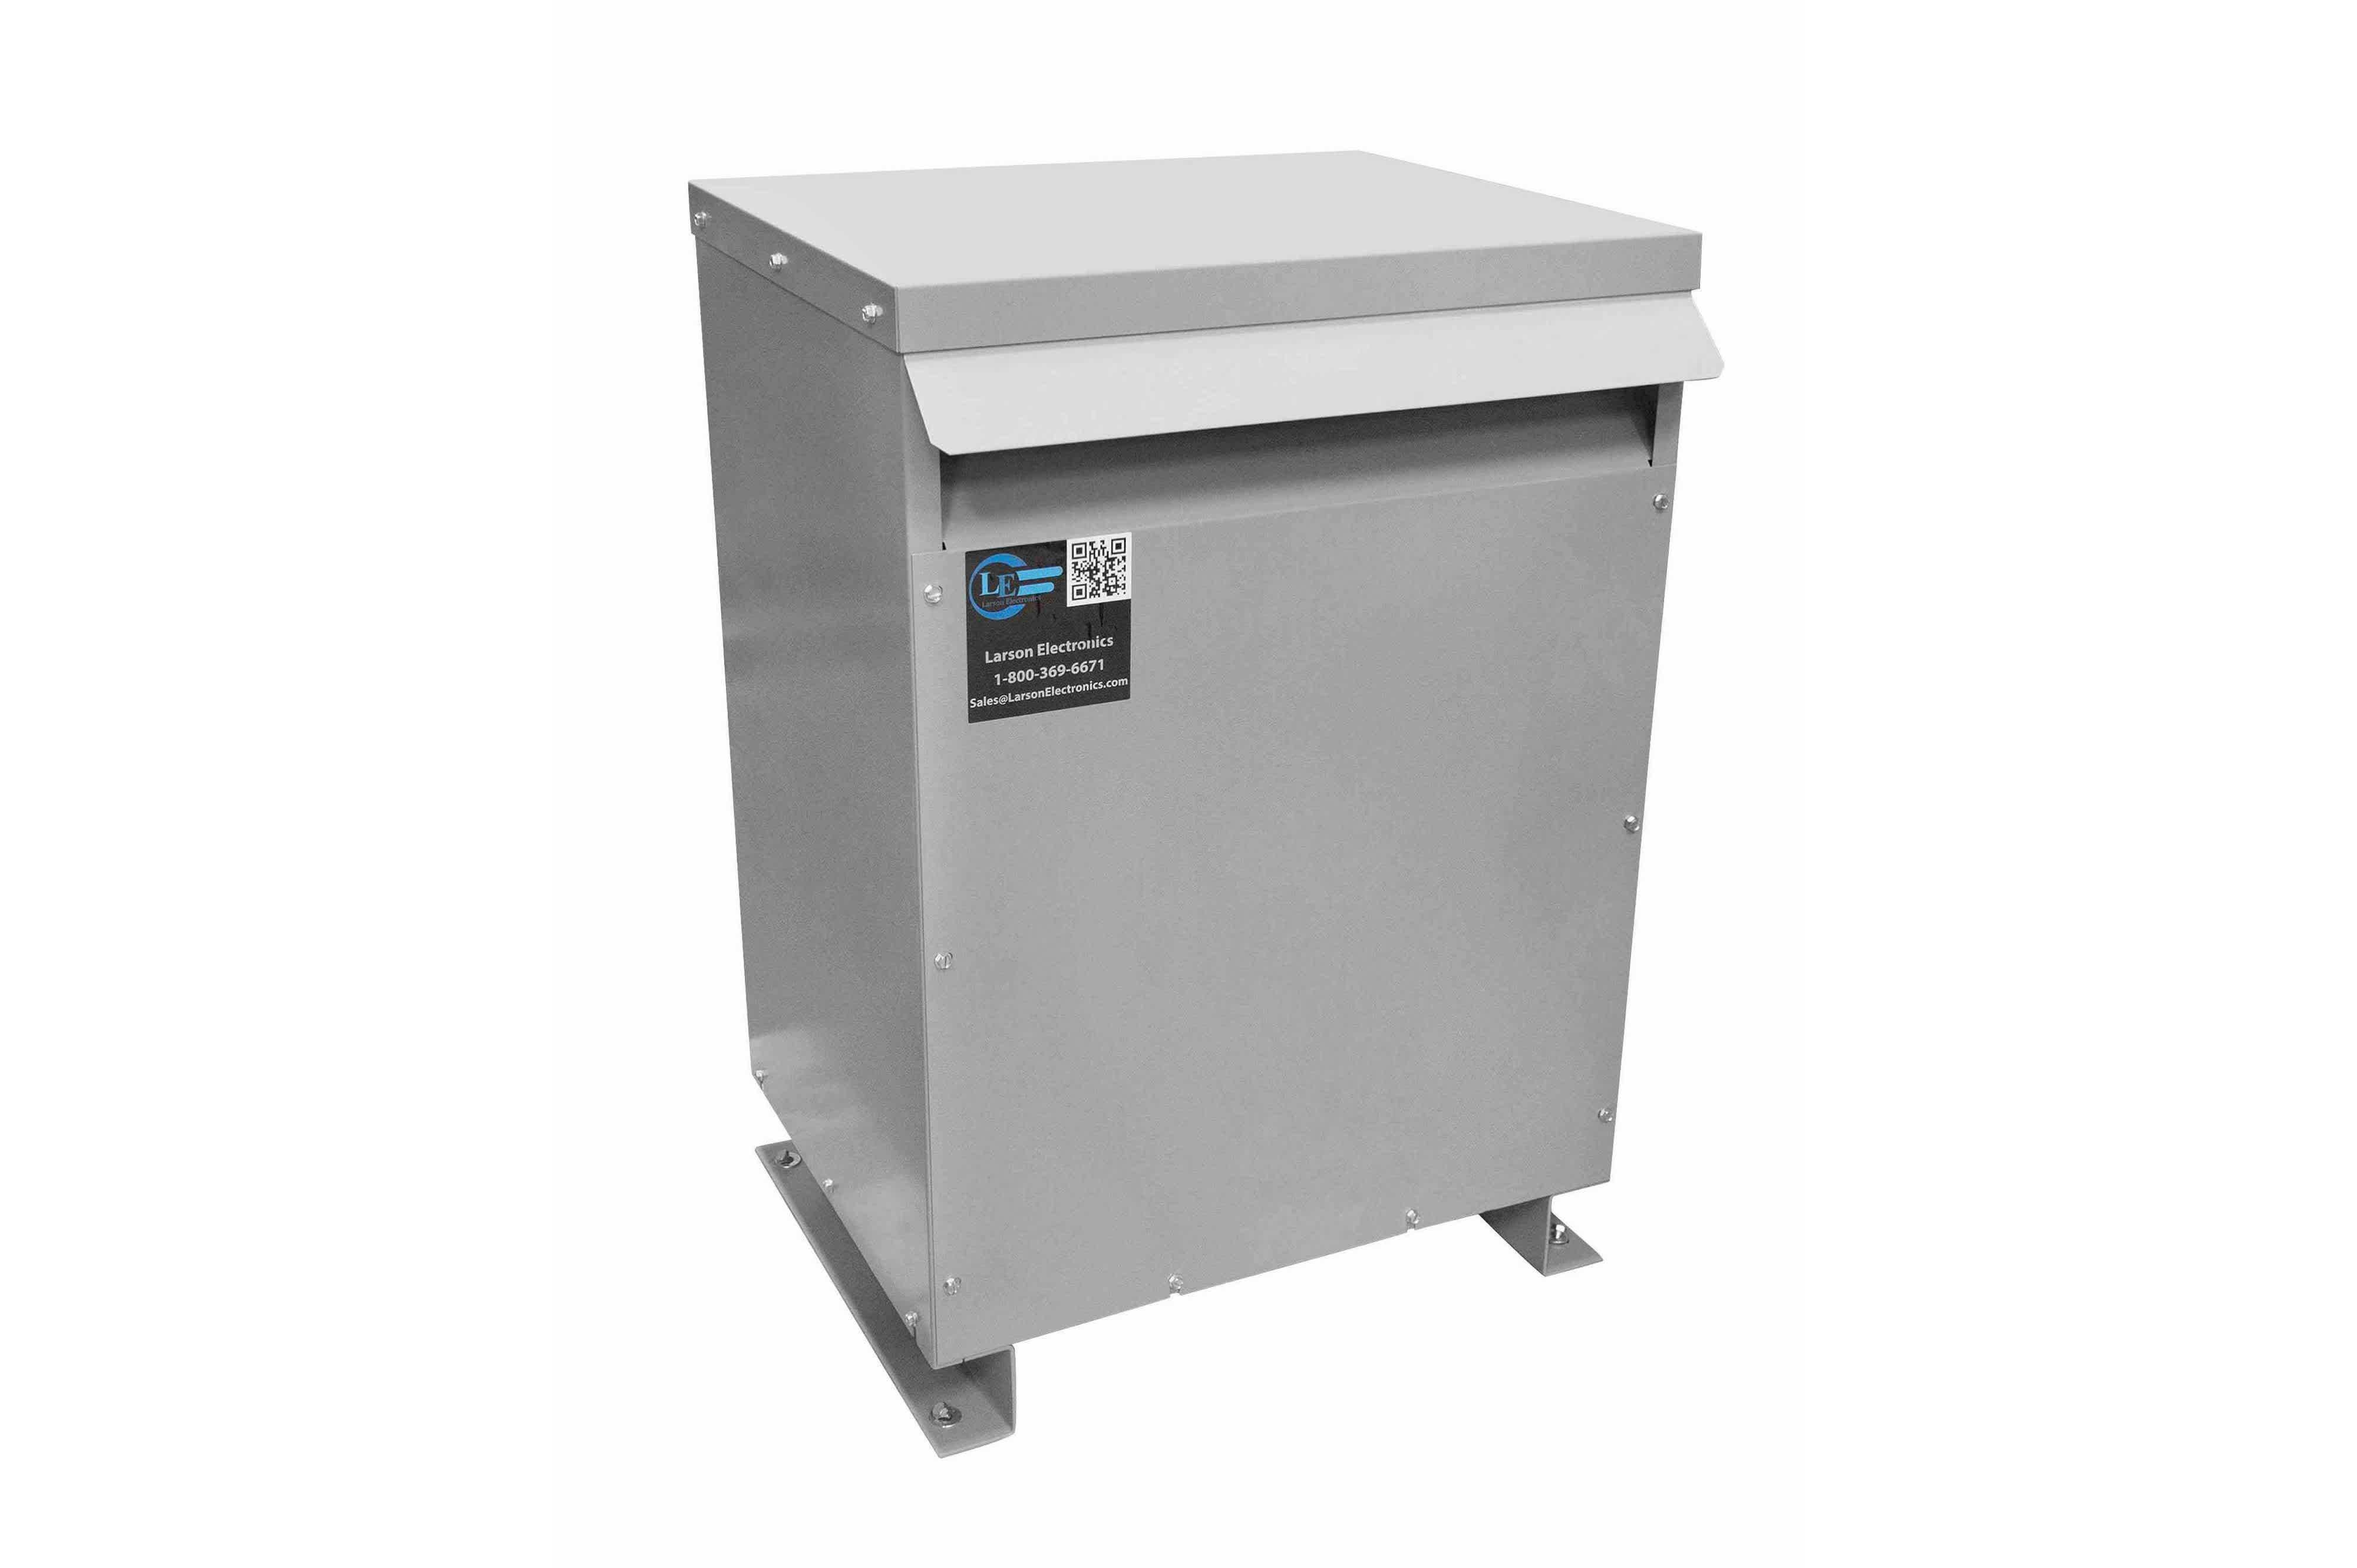 225 kVA 3PH Isolation Transformer, 415V Wye Primary, 208V Delta Secondary, N3R, Ventilated, 60 Hz